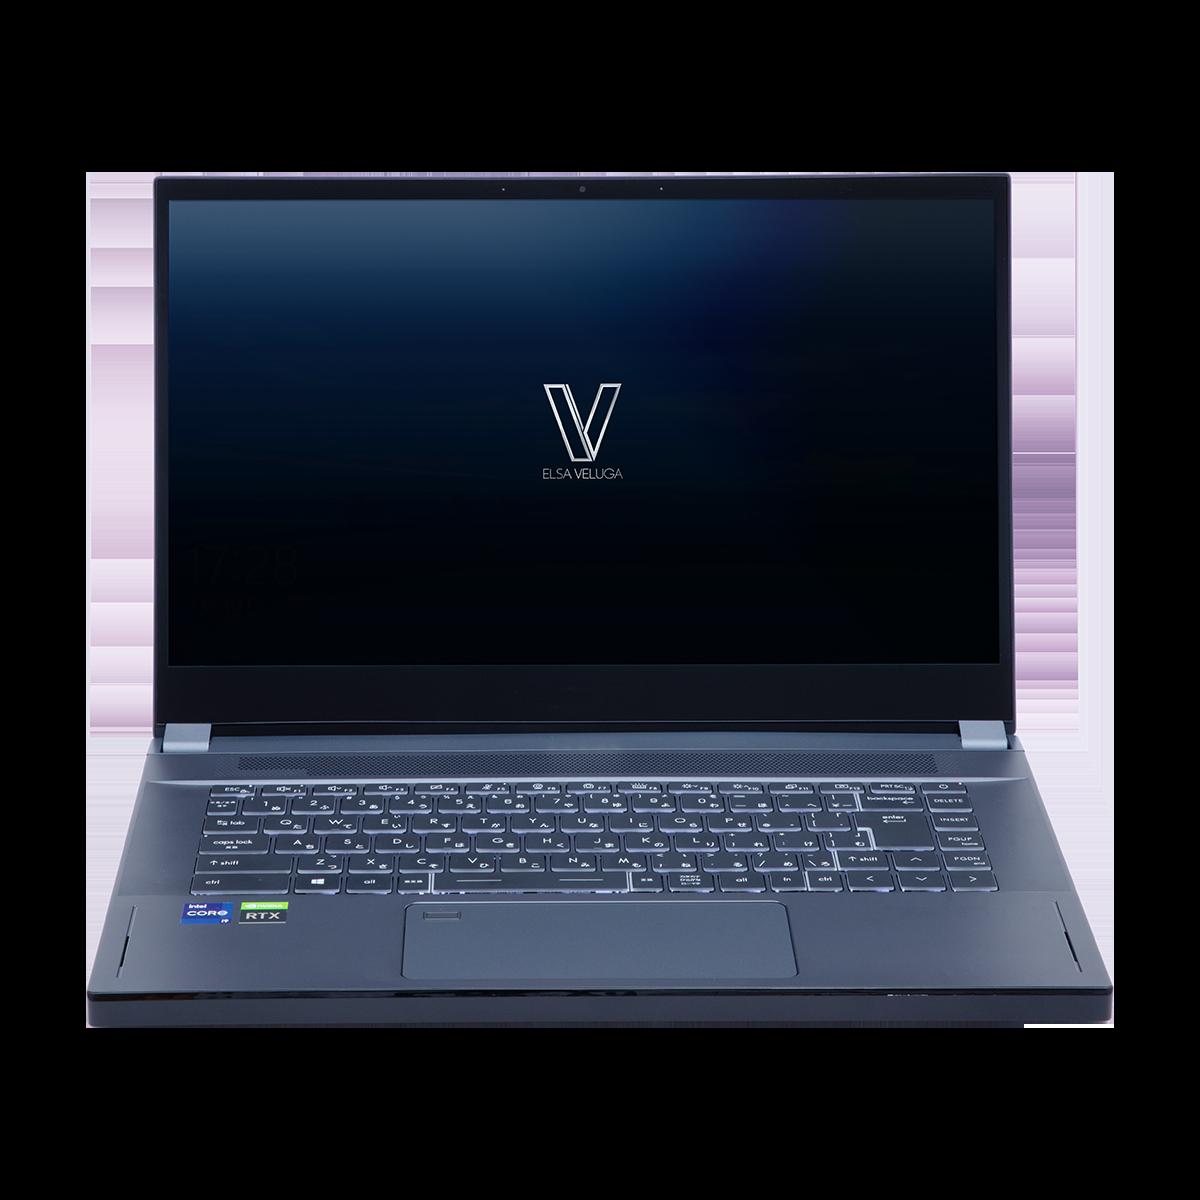 VELUGA A5000 G3-15(Ubuntu版))15.6インチ / Core i9 11900H / RTX A5000 / メモリ 64GB / SSD 2TB /Ubuntu / ノートパソコン ELSA エルザ モバイルワークステーション ELVG315-i9A5K6412SUR 【代引・日時指定・キャンセル不可・北海道沖縄離島配送不可】